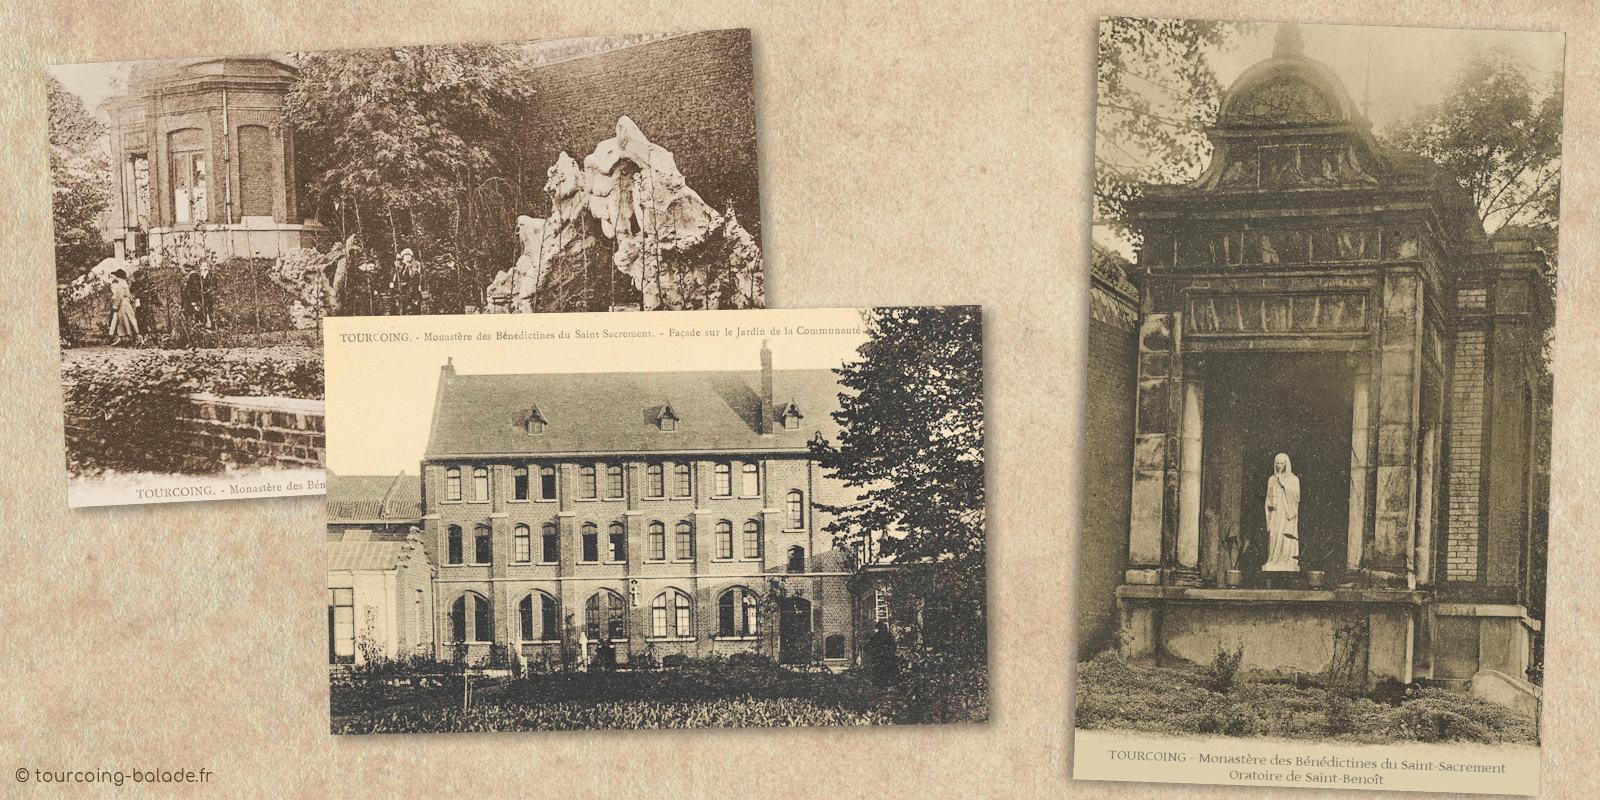 Cartes postales anciennes - Monastère Bénédictines Tourcoing